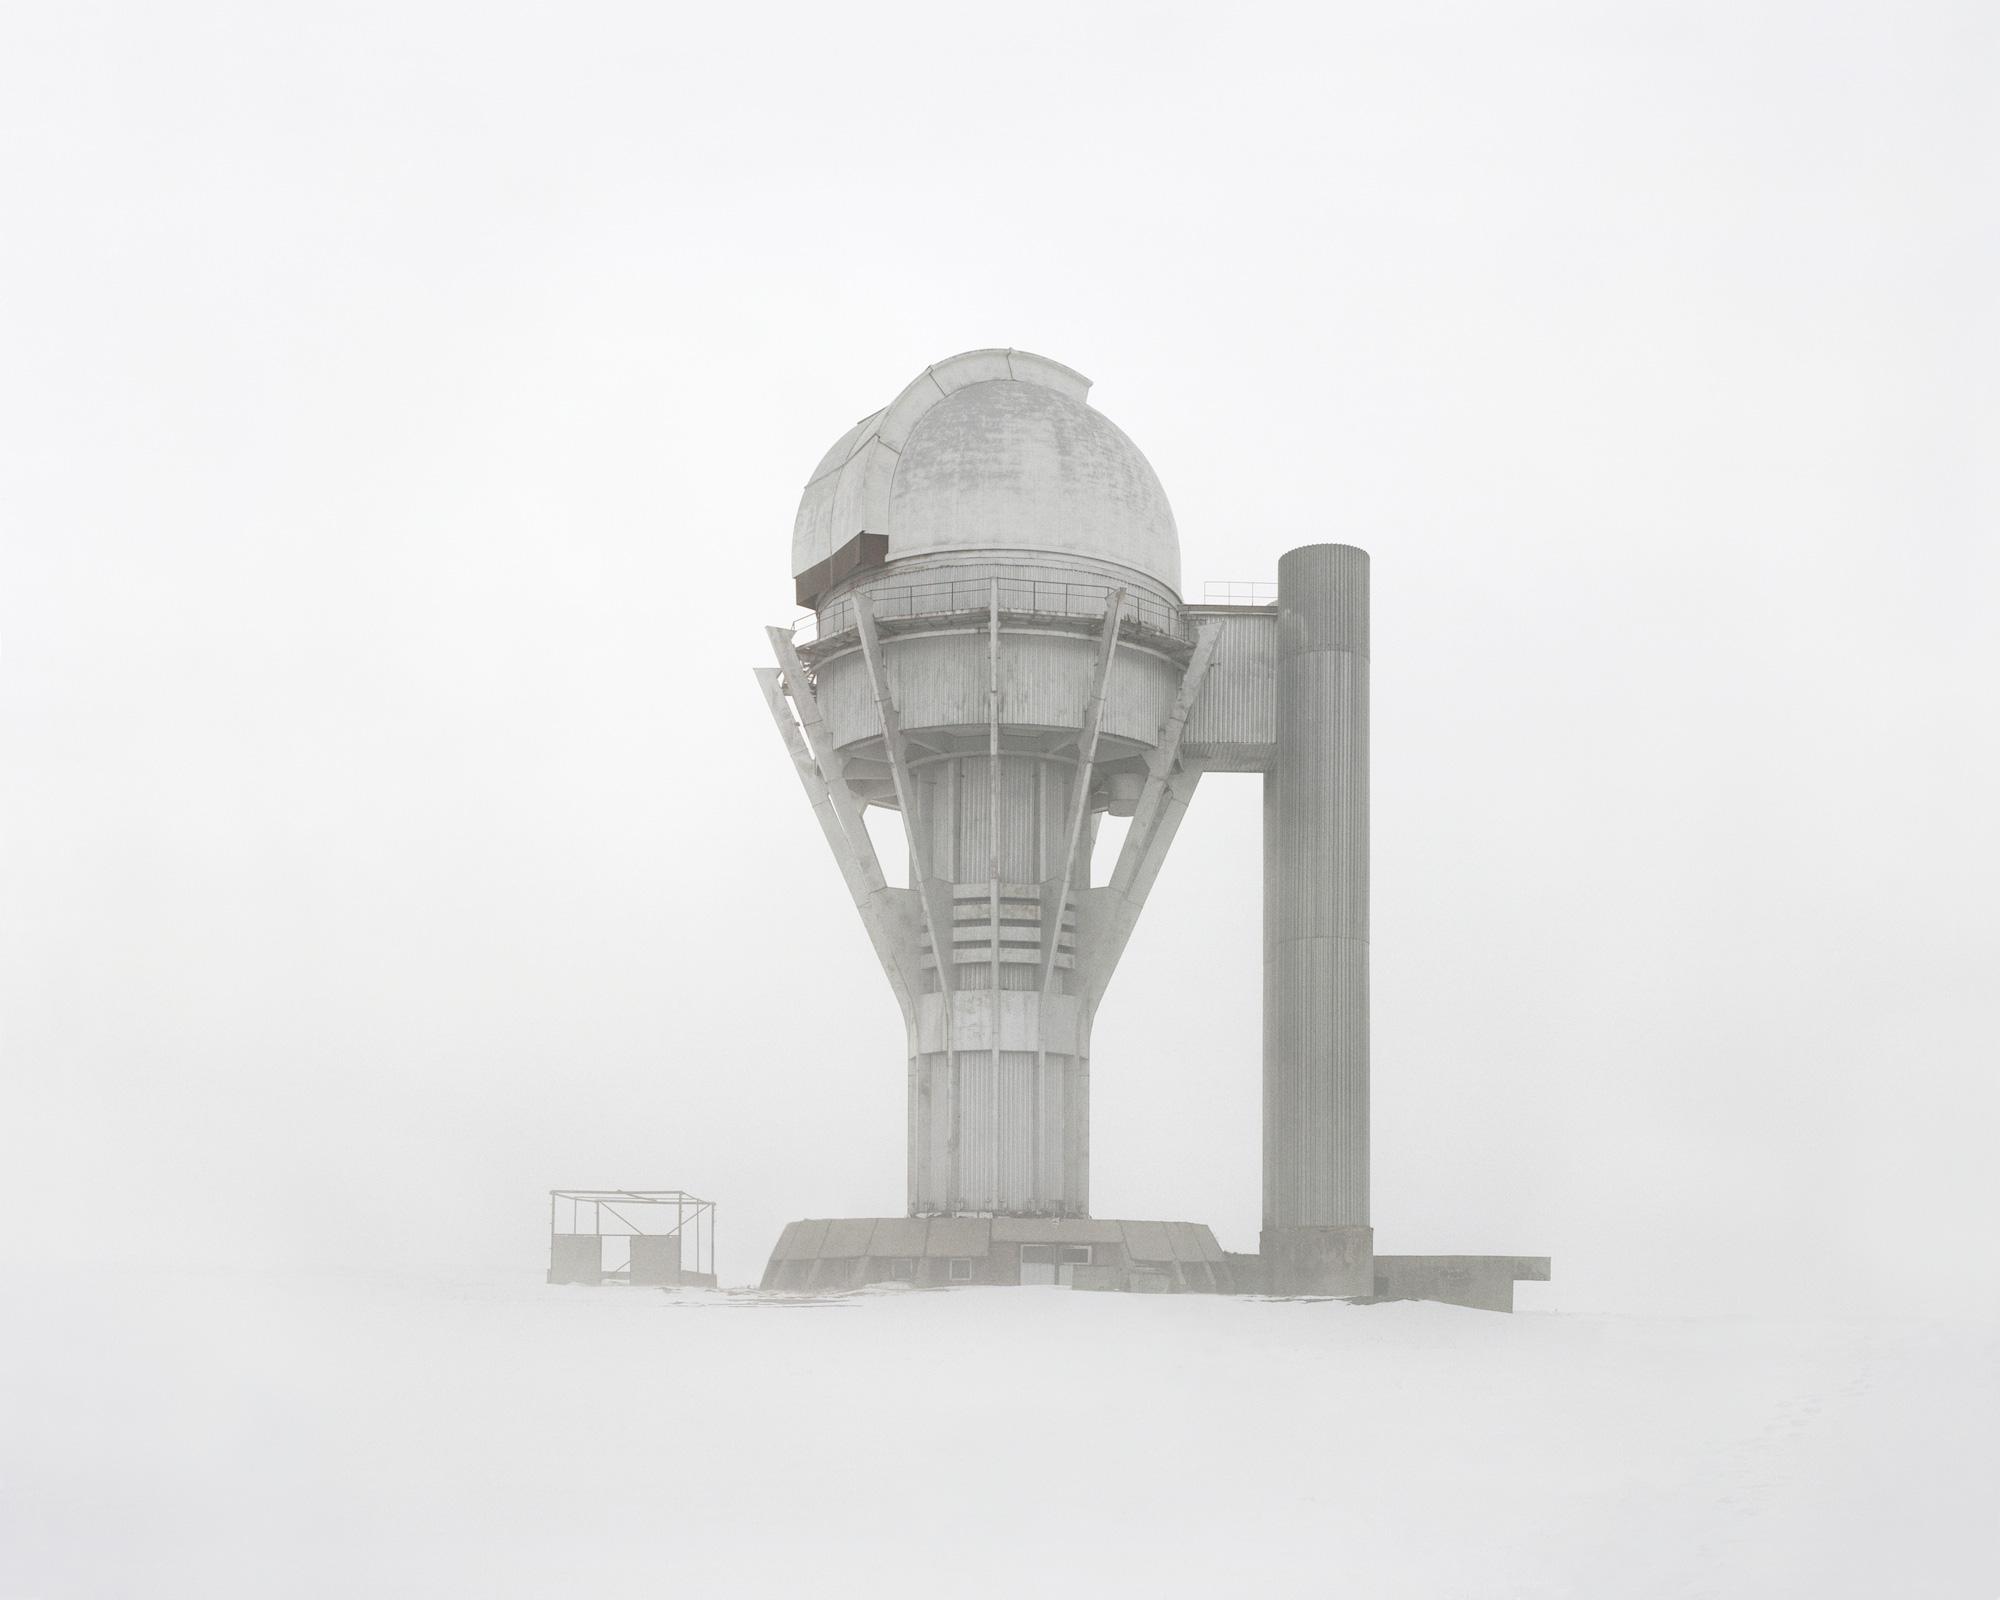 Verlassenes Observatorium – Kasachstan, Gebiet Almaty, 2015